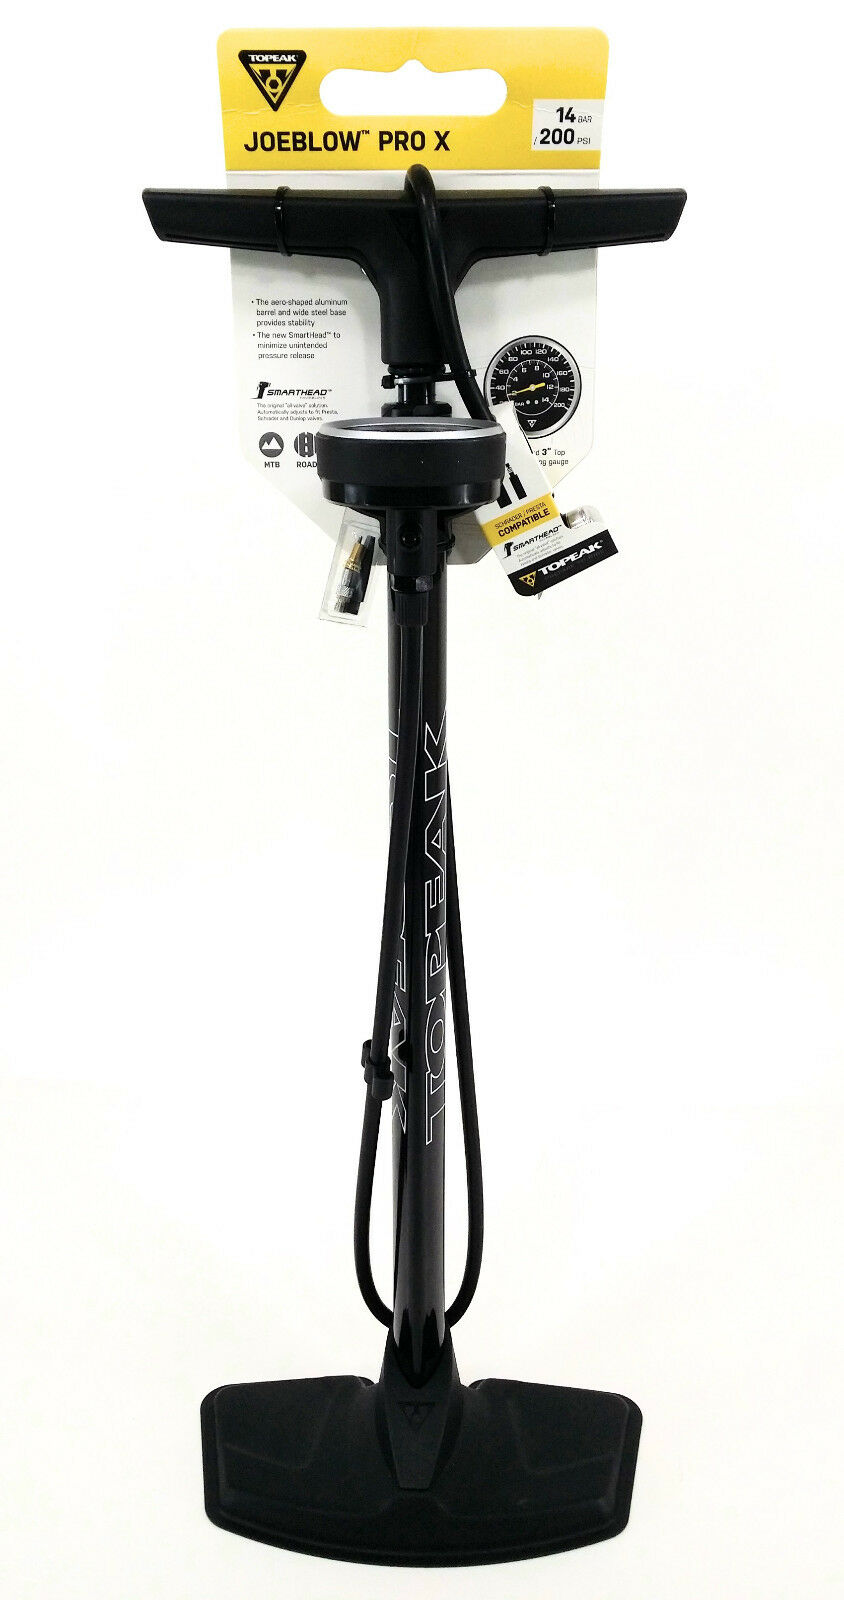 Topeak Joe Blow Pro X 200psi Bomba de pie Smarthead DX Presta & Schrader Bicicleta